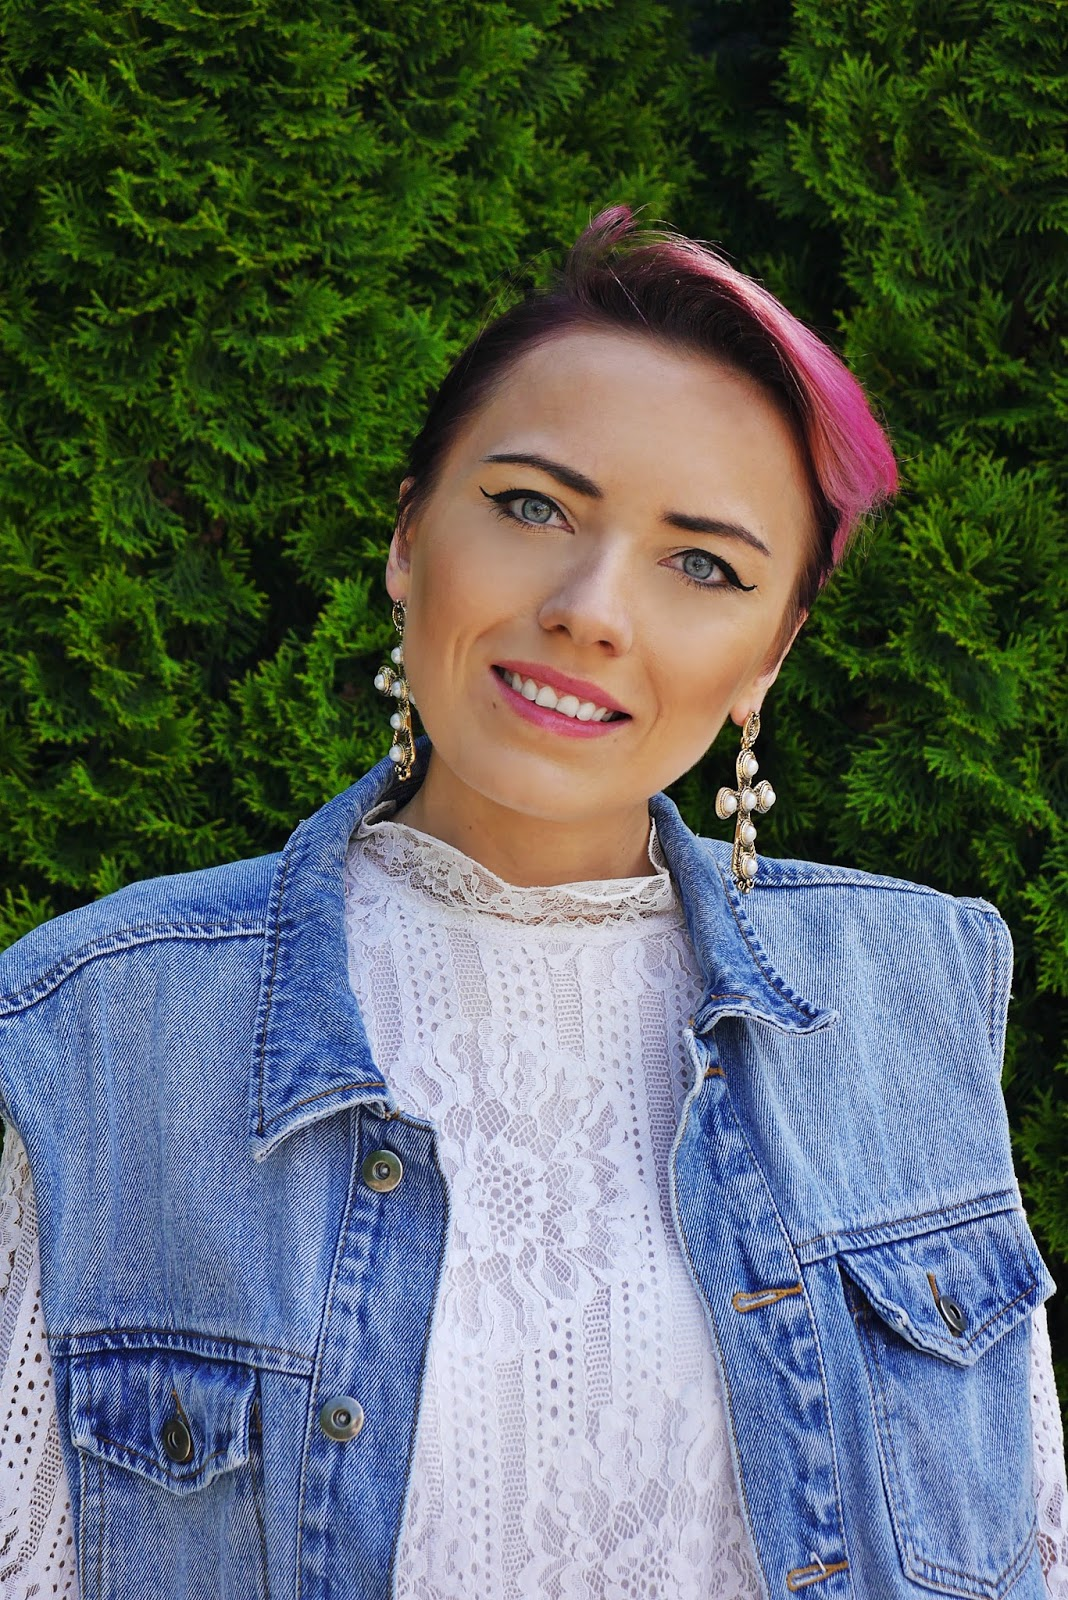 sukienka_koronkowa_kamizelka_jeansowa_torebka_gamiss_karyn_blog_220617agh